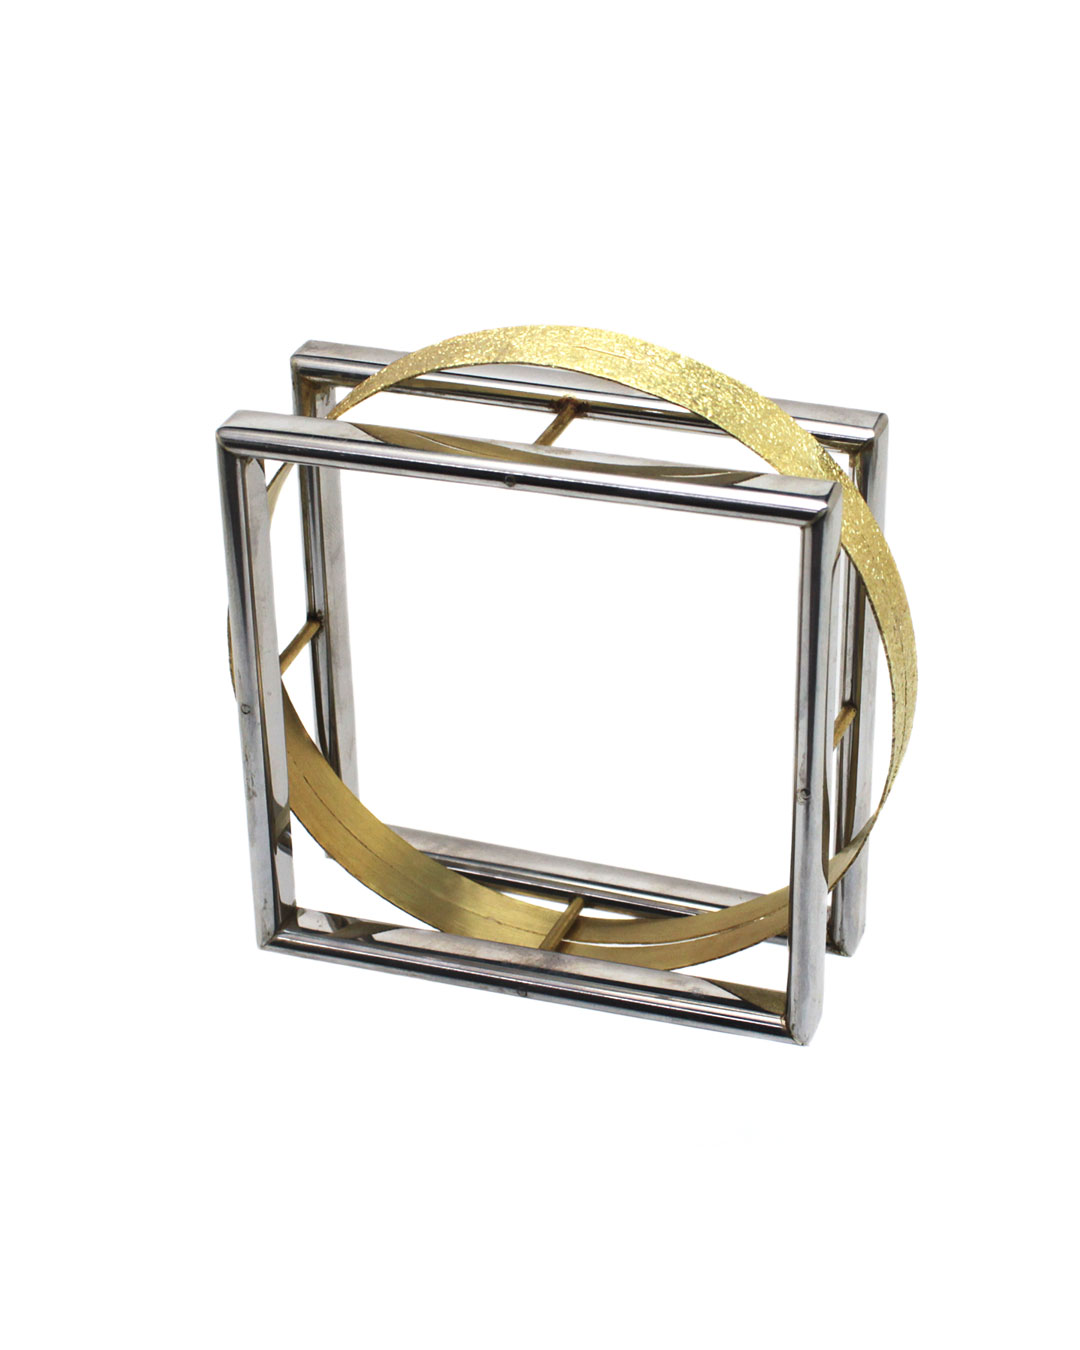 Okinari Kurokawa, untitled, 2014, bracelet, 20ct gold, stainless steel, 75 x 75 x 26 mm, €2950